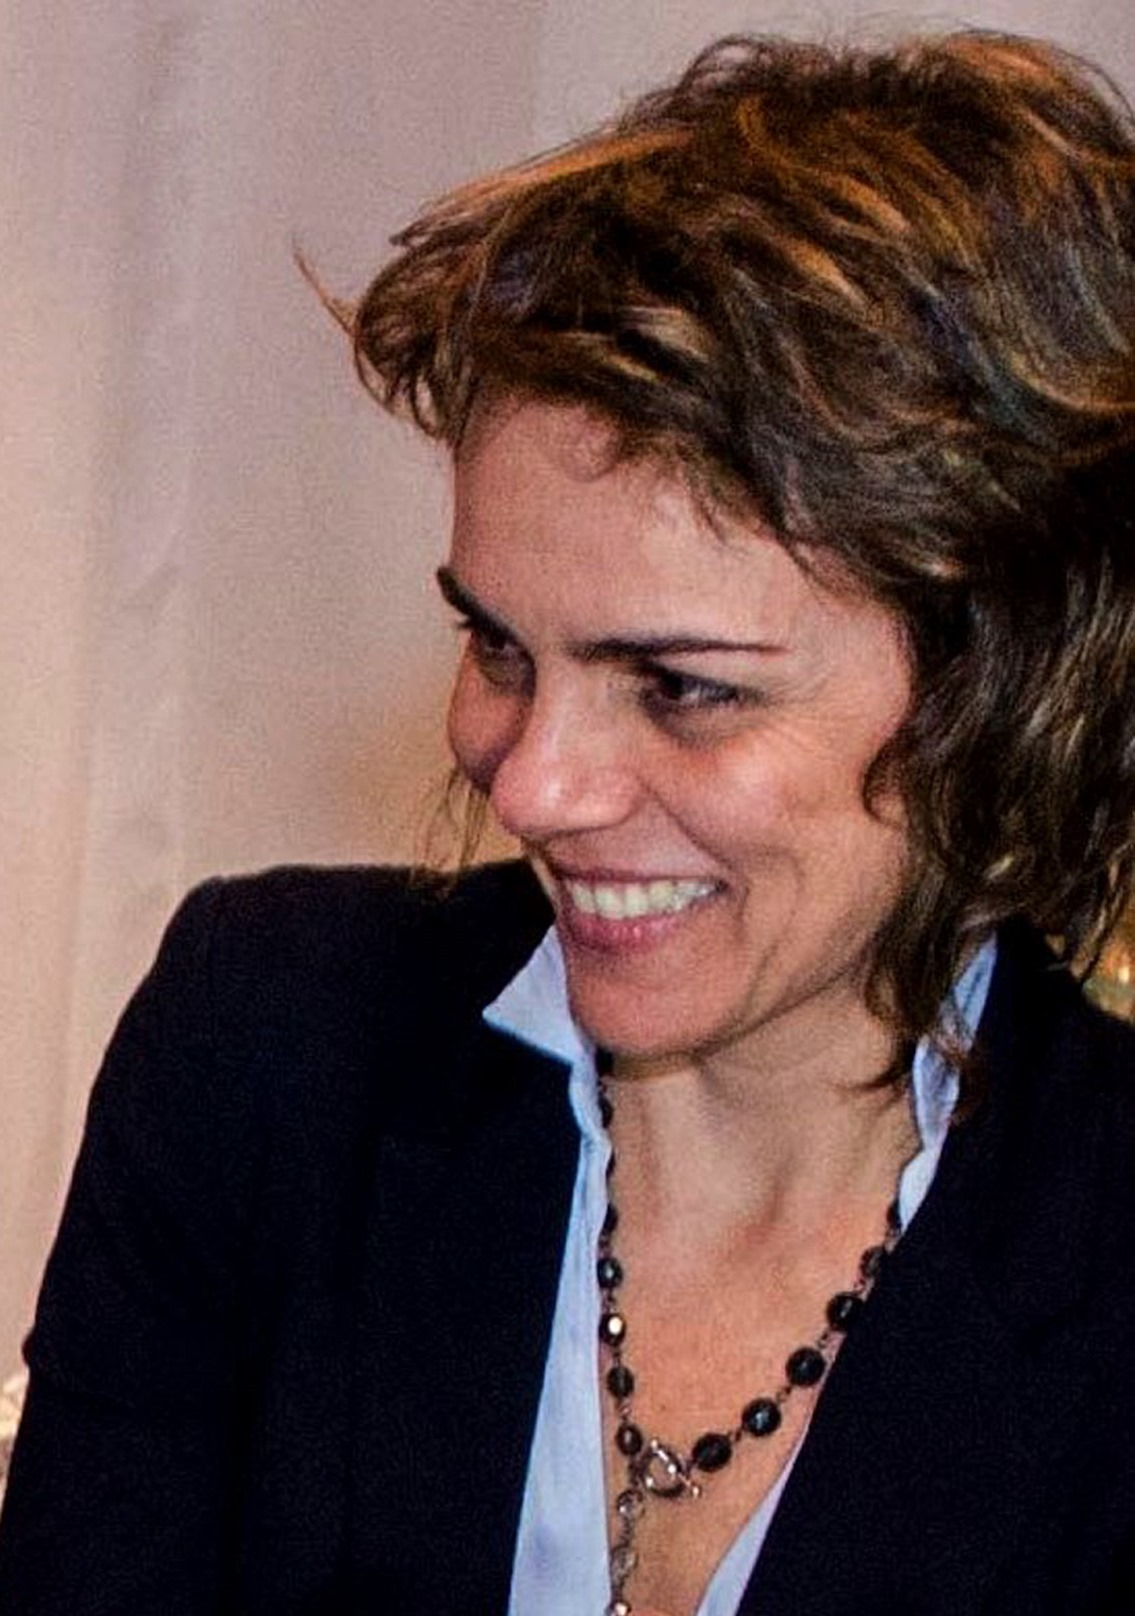 Eveline Costa, diretoraCADA VEZ MAIS LONGE